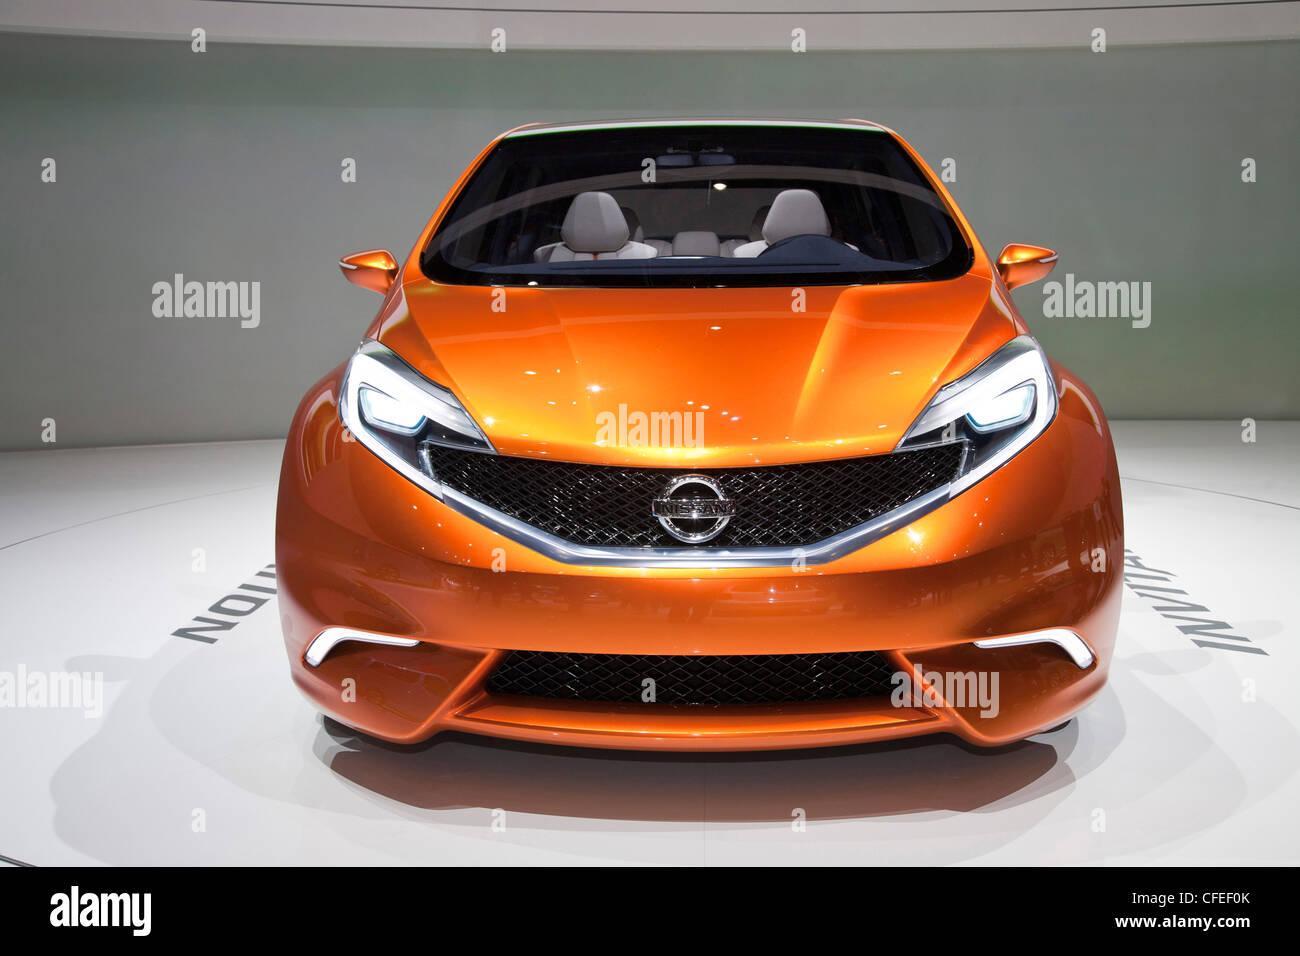 Nissan Invitation at the Geneva Motor Show 2012 - Stock Image